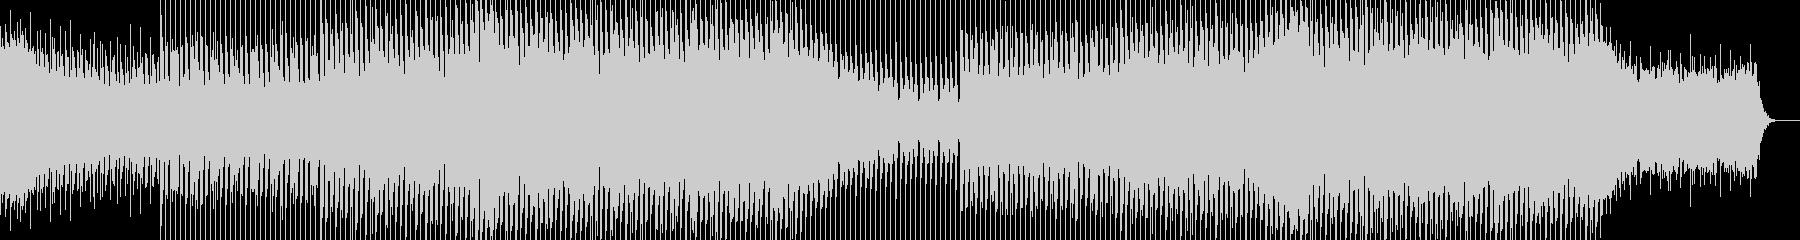 EDMポップで明るいクラブ系-16の未再生の波形